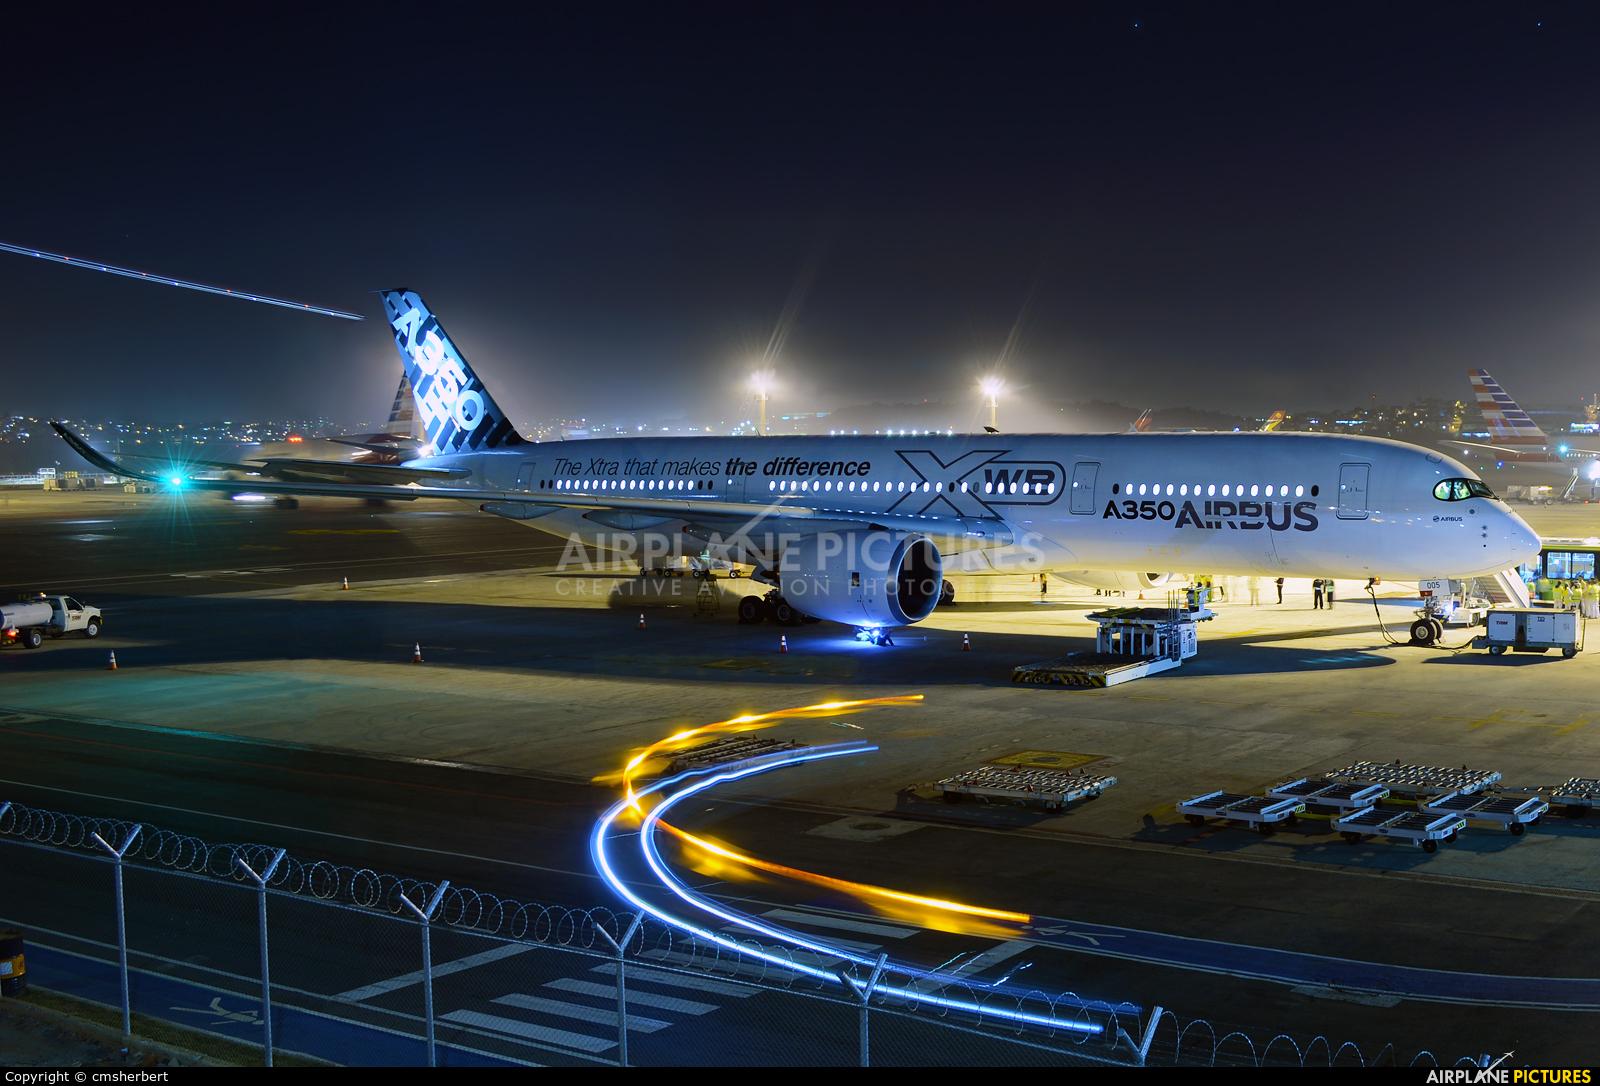 Airbus Industrie F-WWYB aircraft at São Paulo - Guarulhos